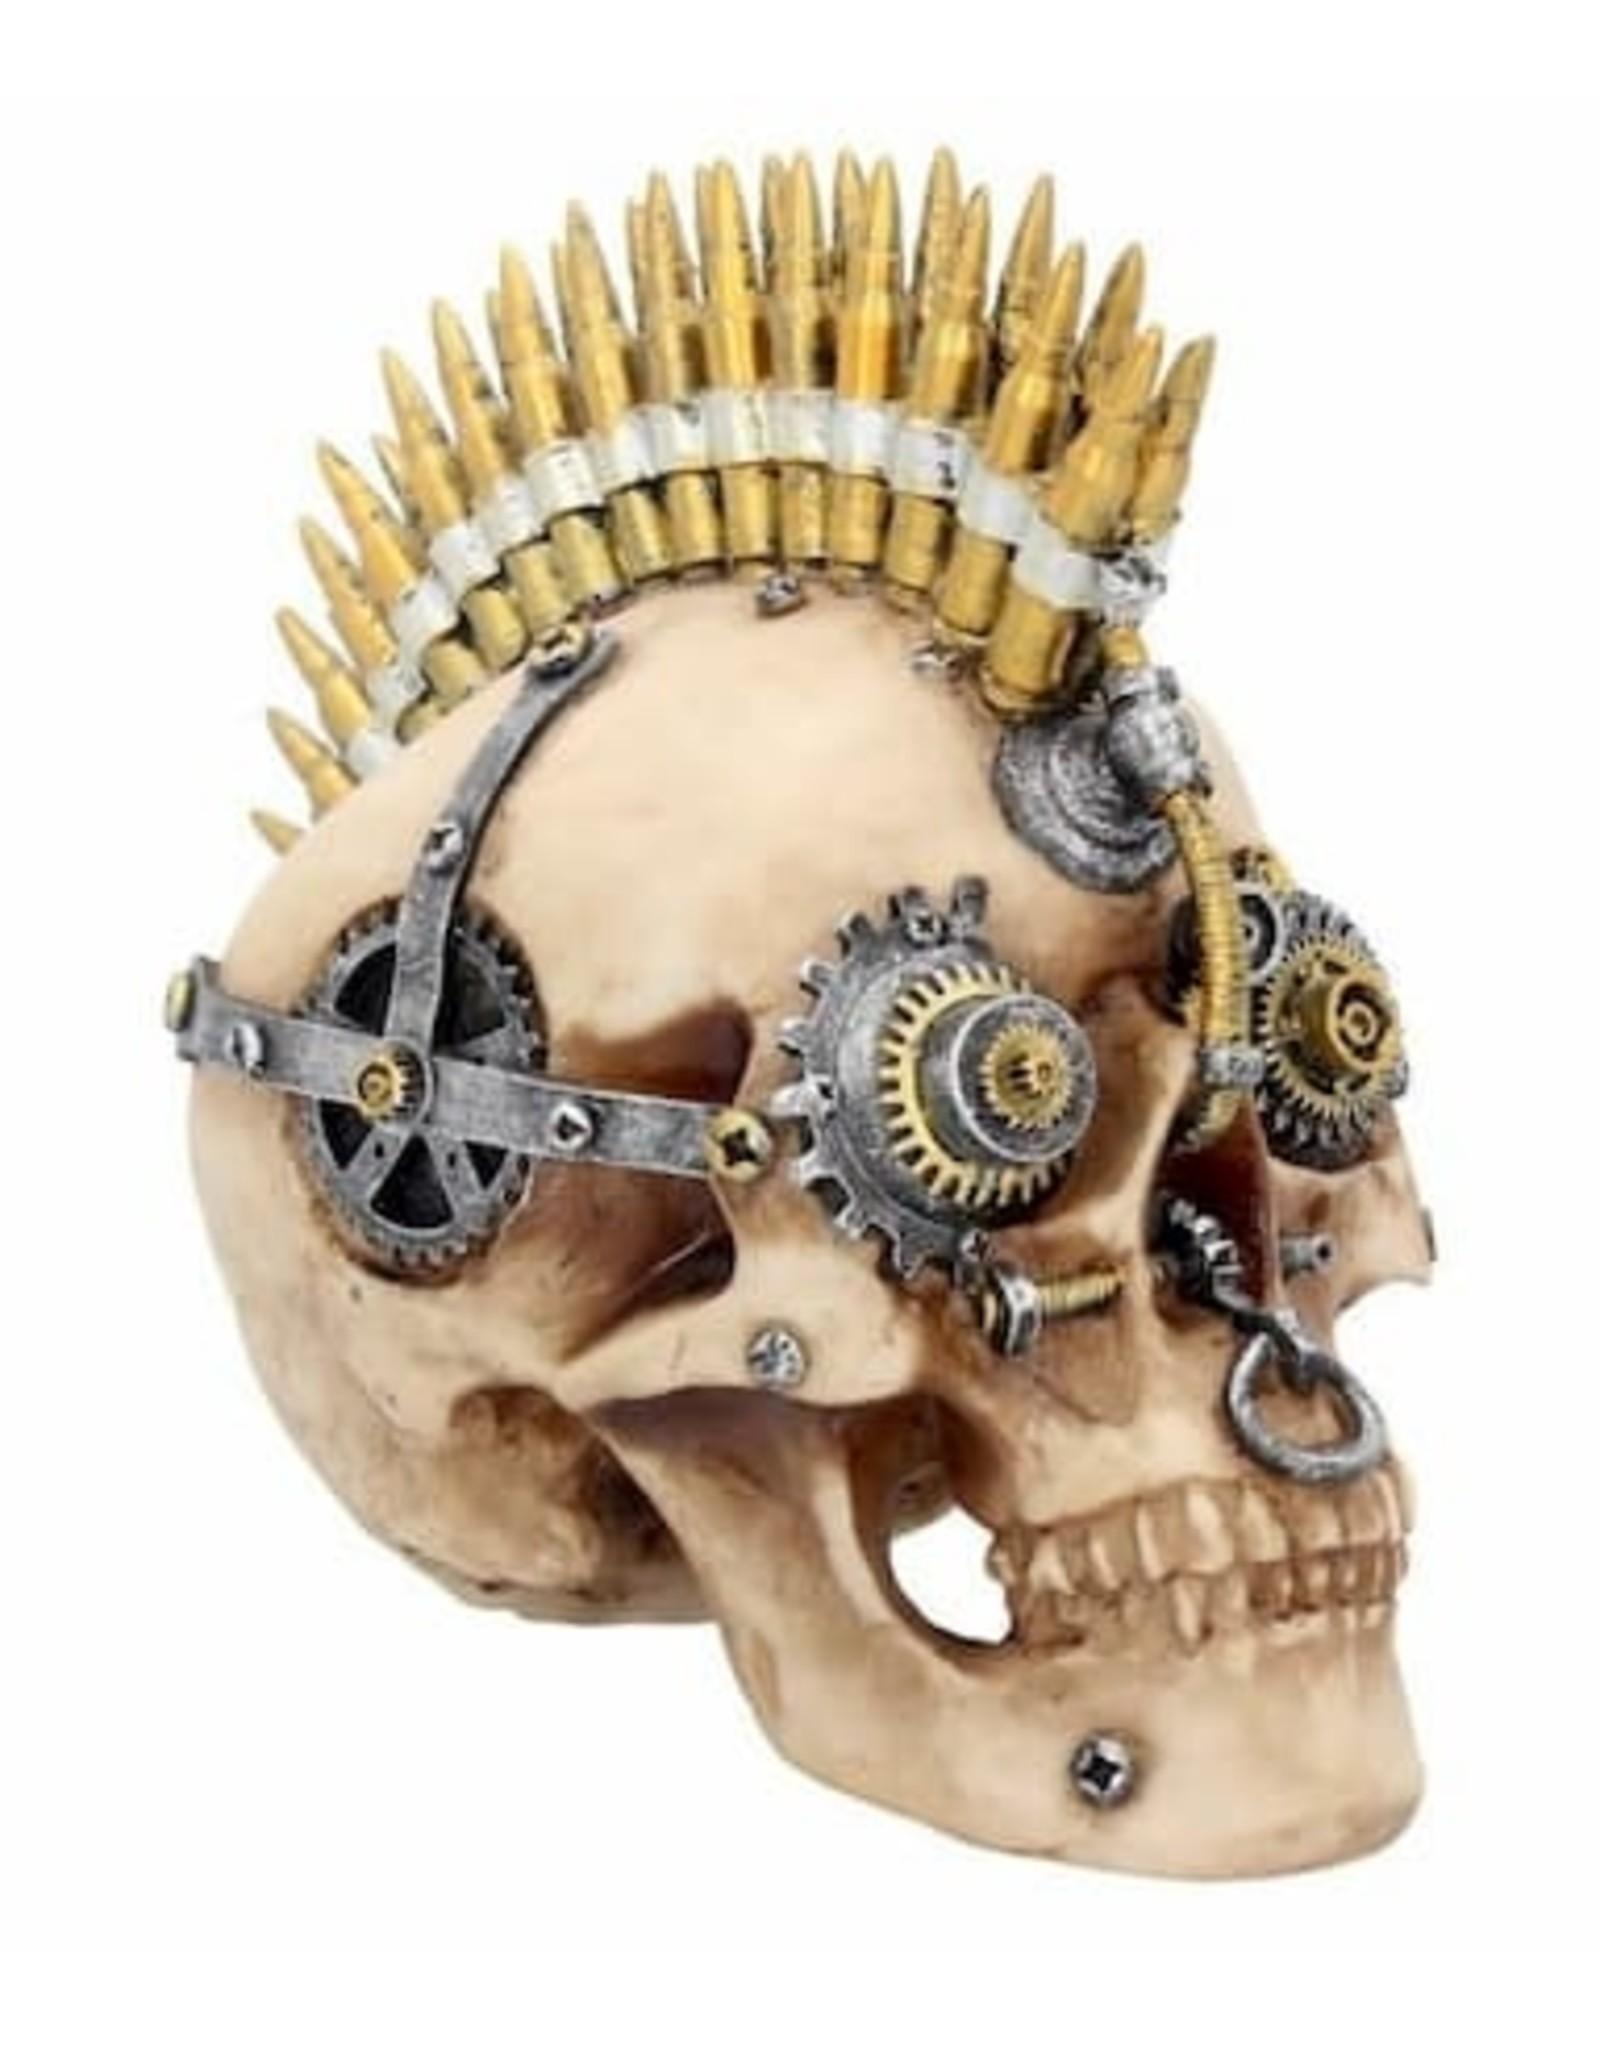 Alator Schedels - Schedel Gears of War Large - Nemesis Now